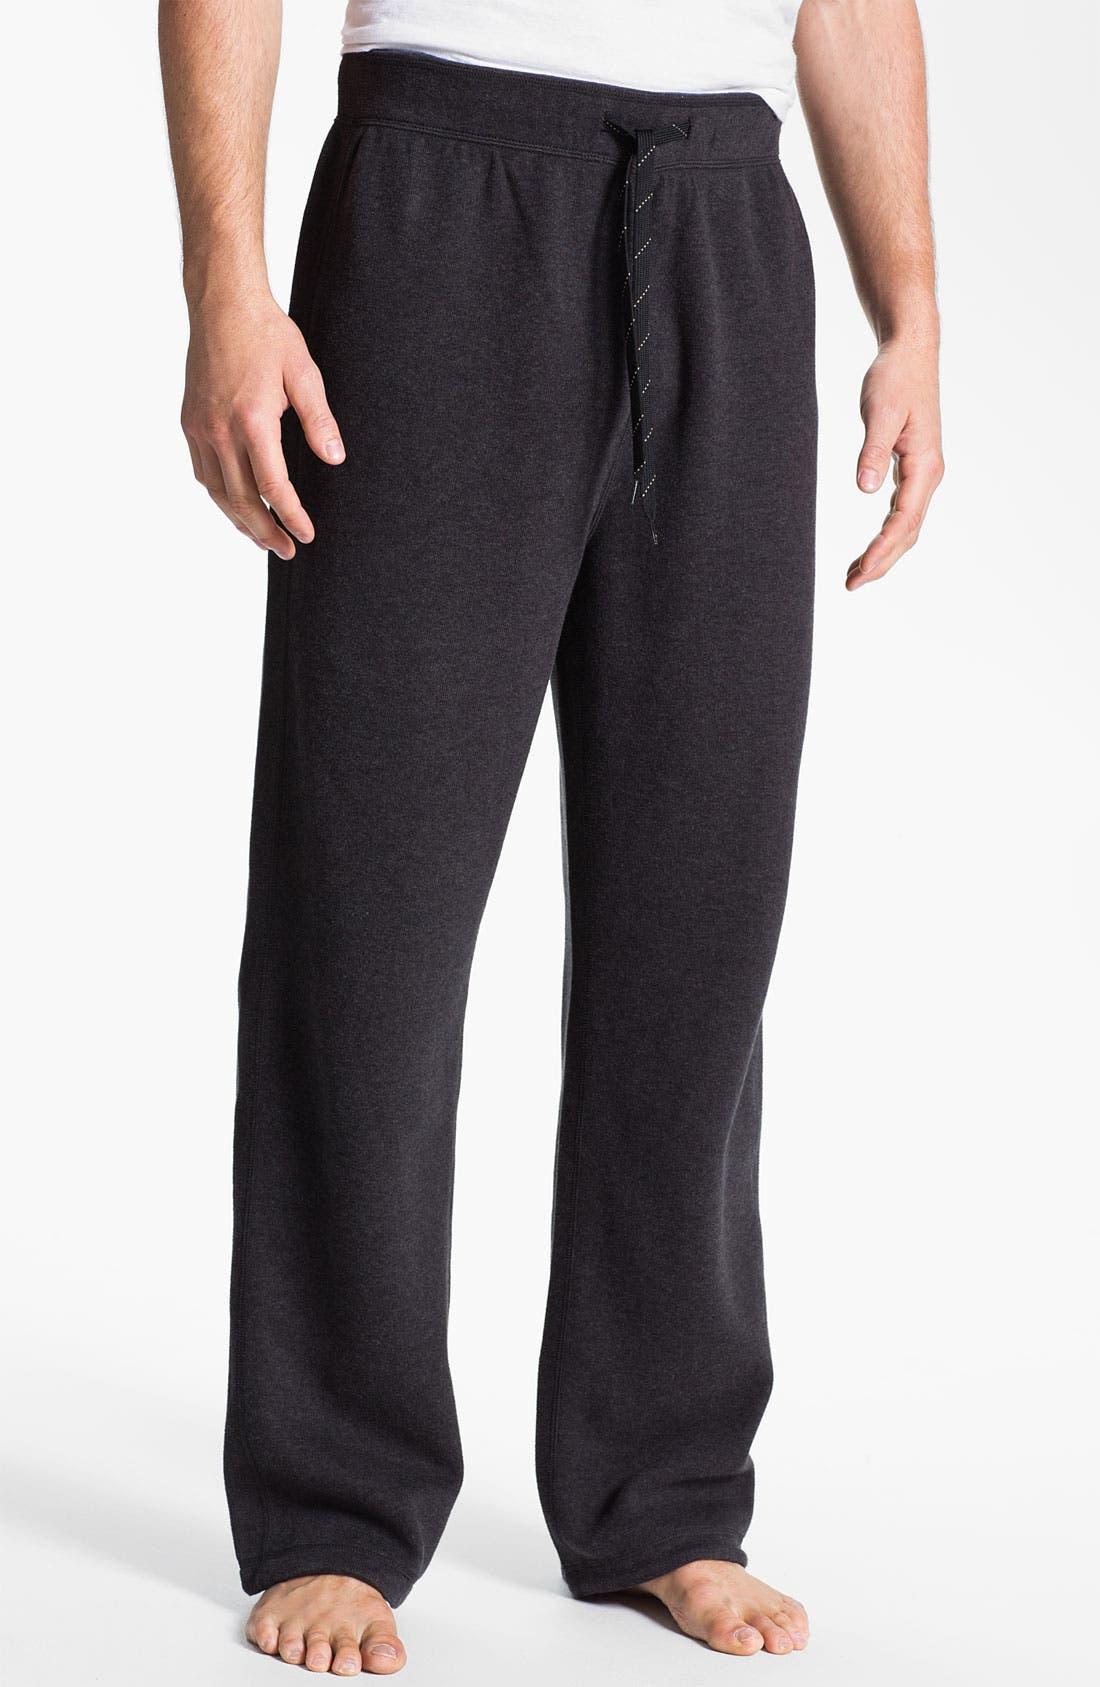 Alternate Image 1 Selected - Tommy Bahama 'Flipside Pro' Reversible Knit Pants